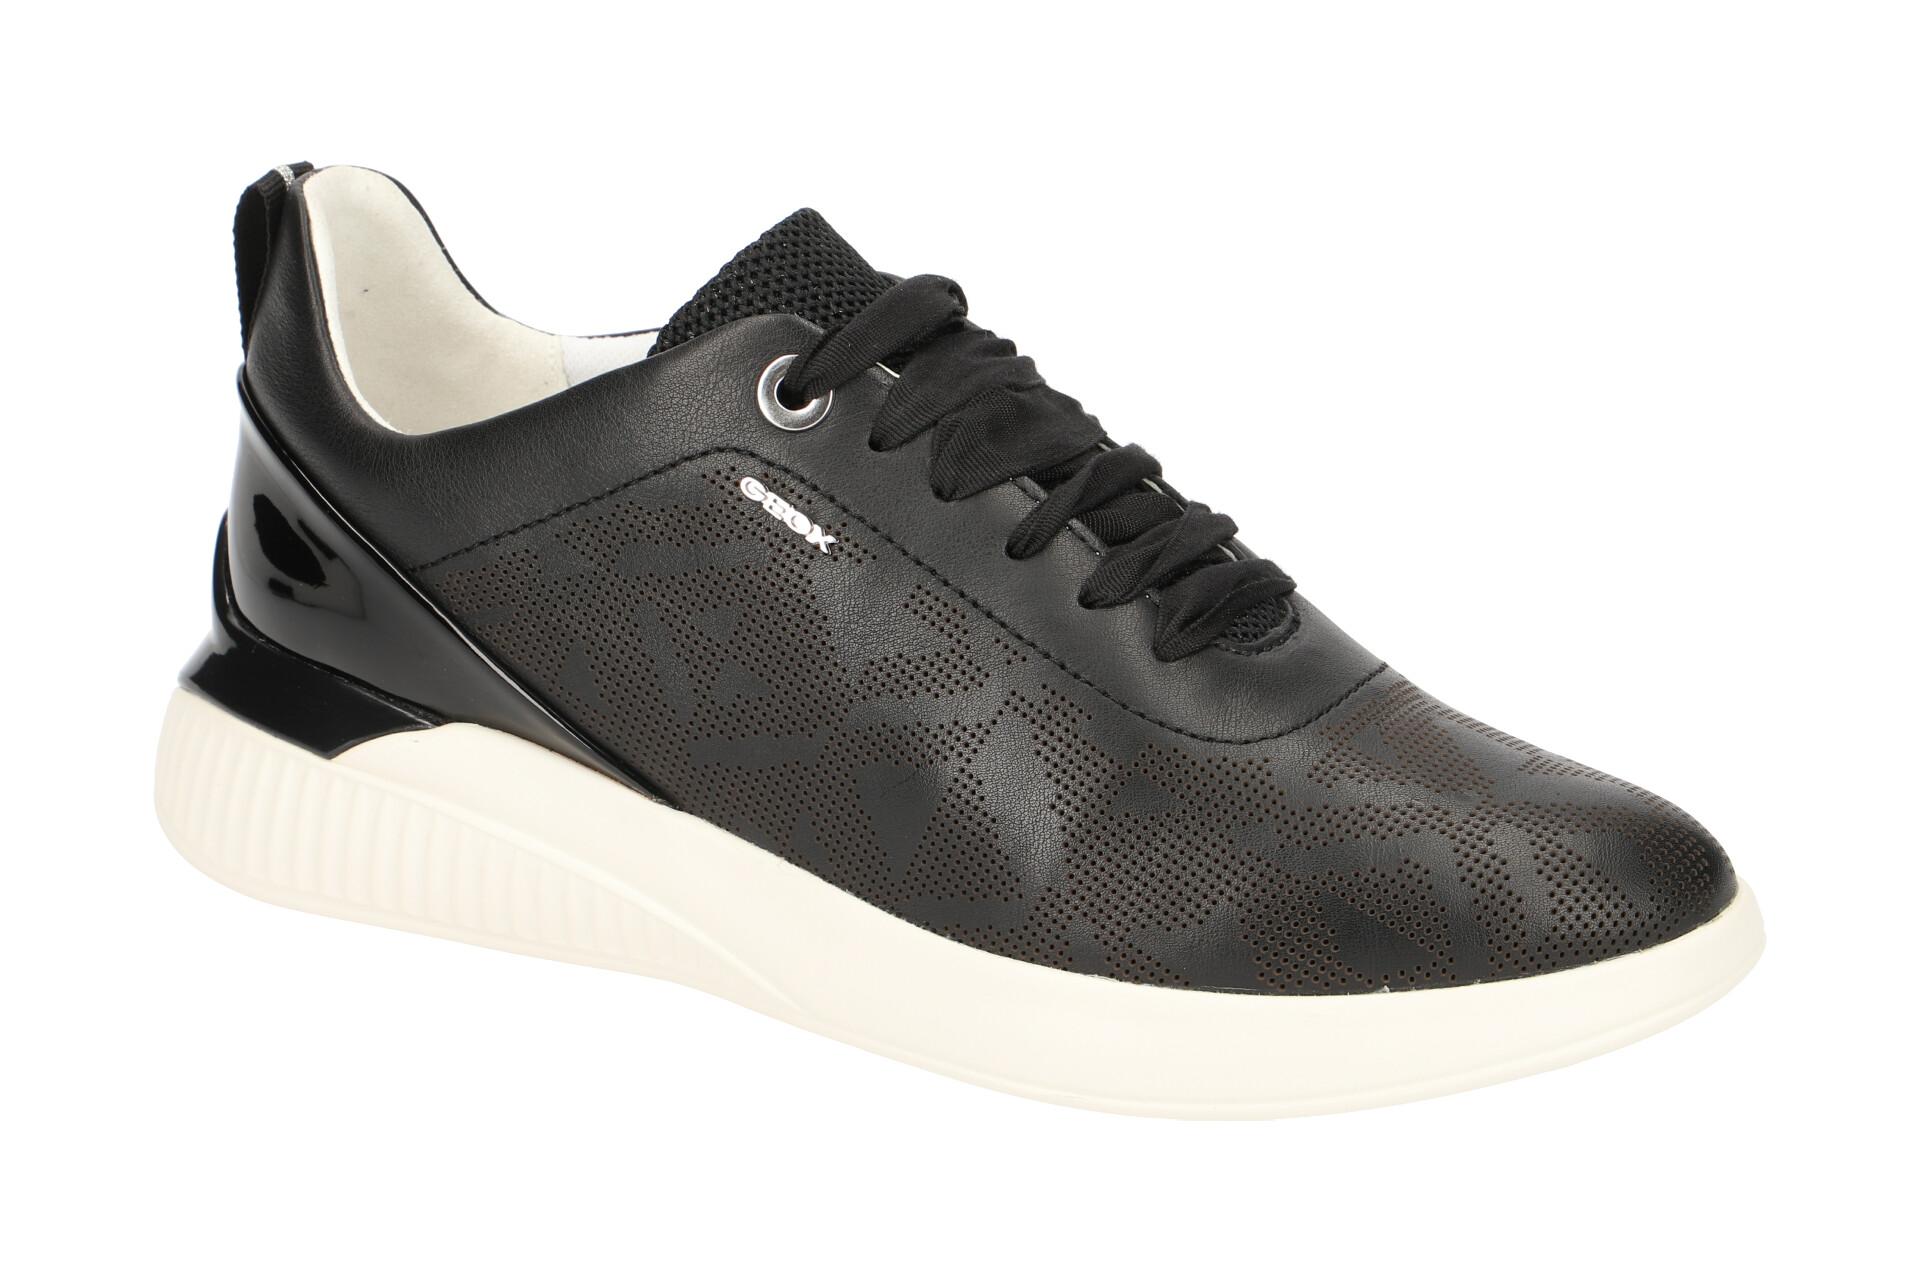 Geox Schuhe THERAGON schwarz Damenschuhe D828SC 00085 C9999 NEU